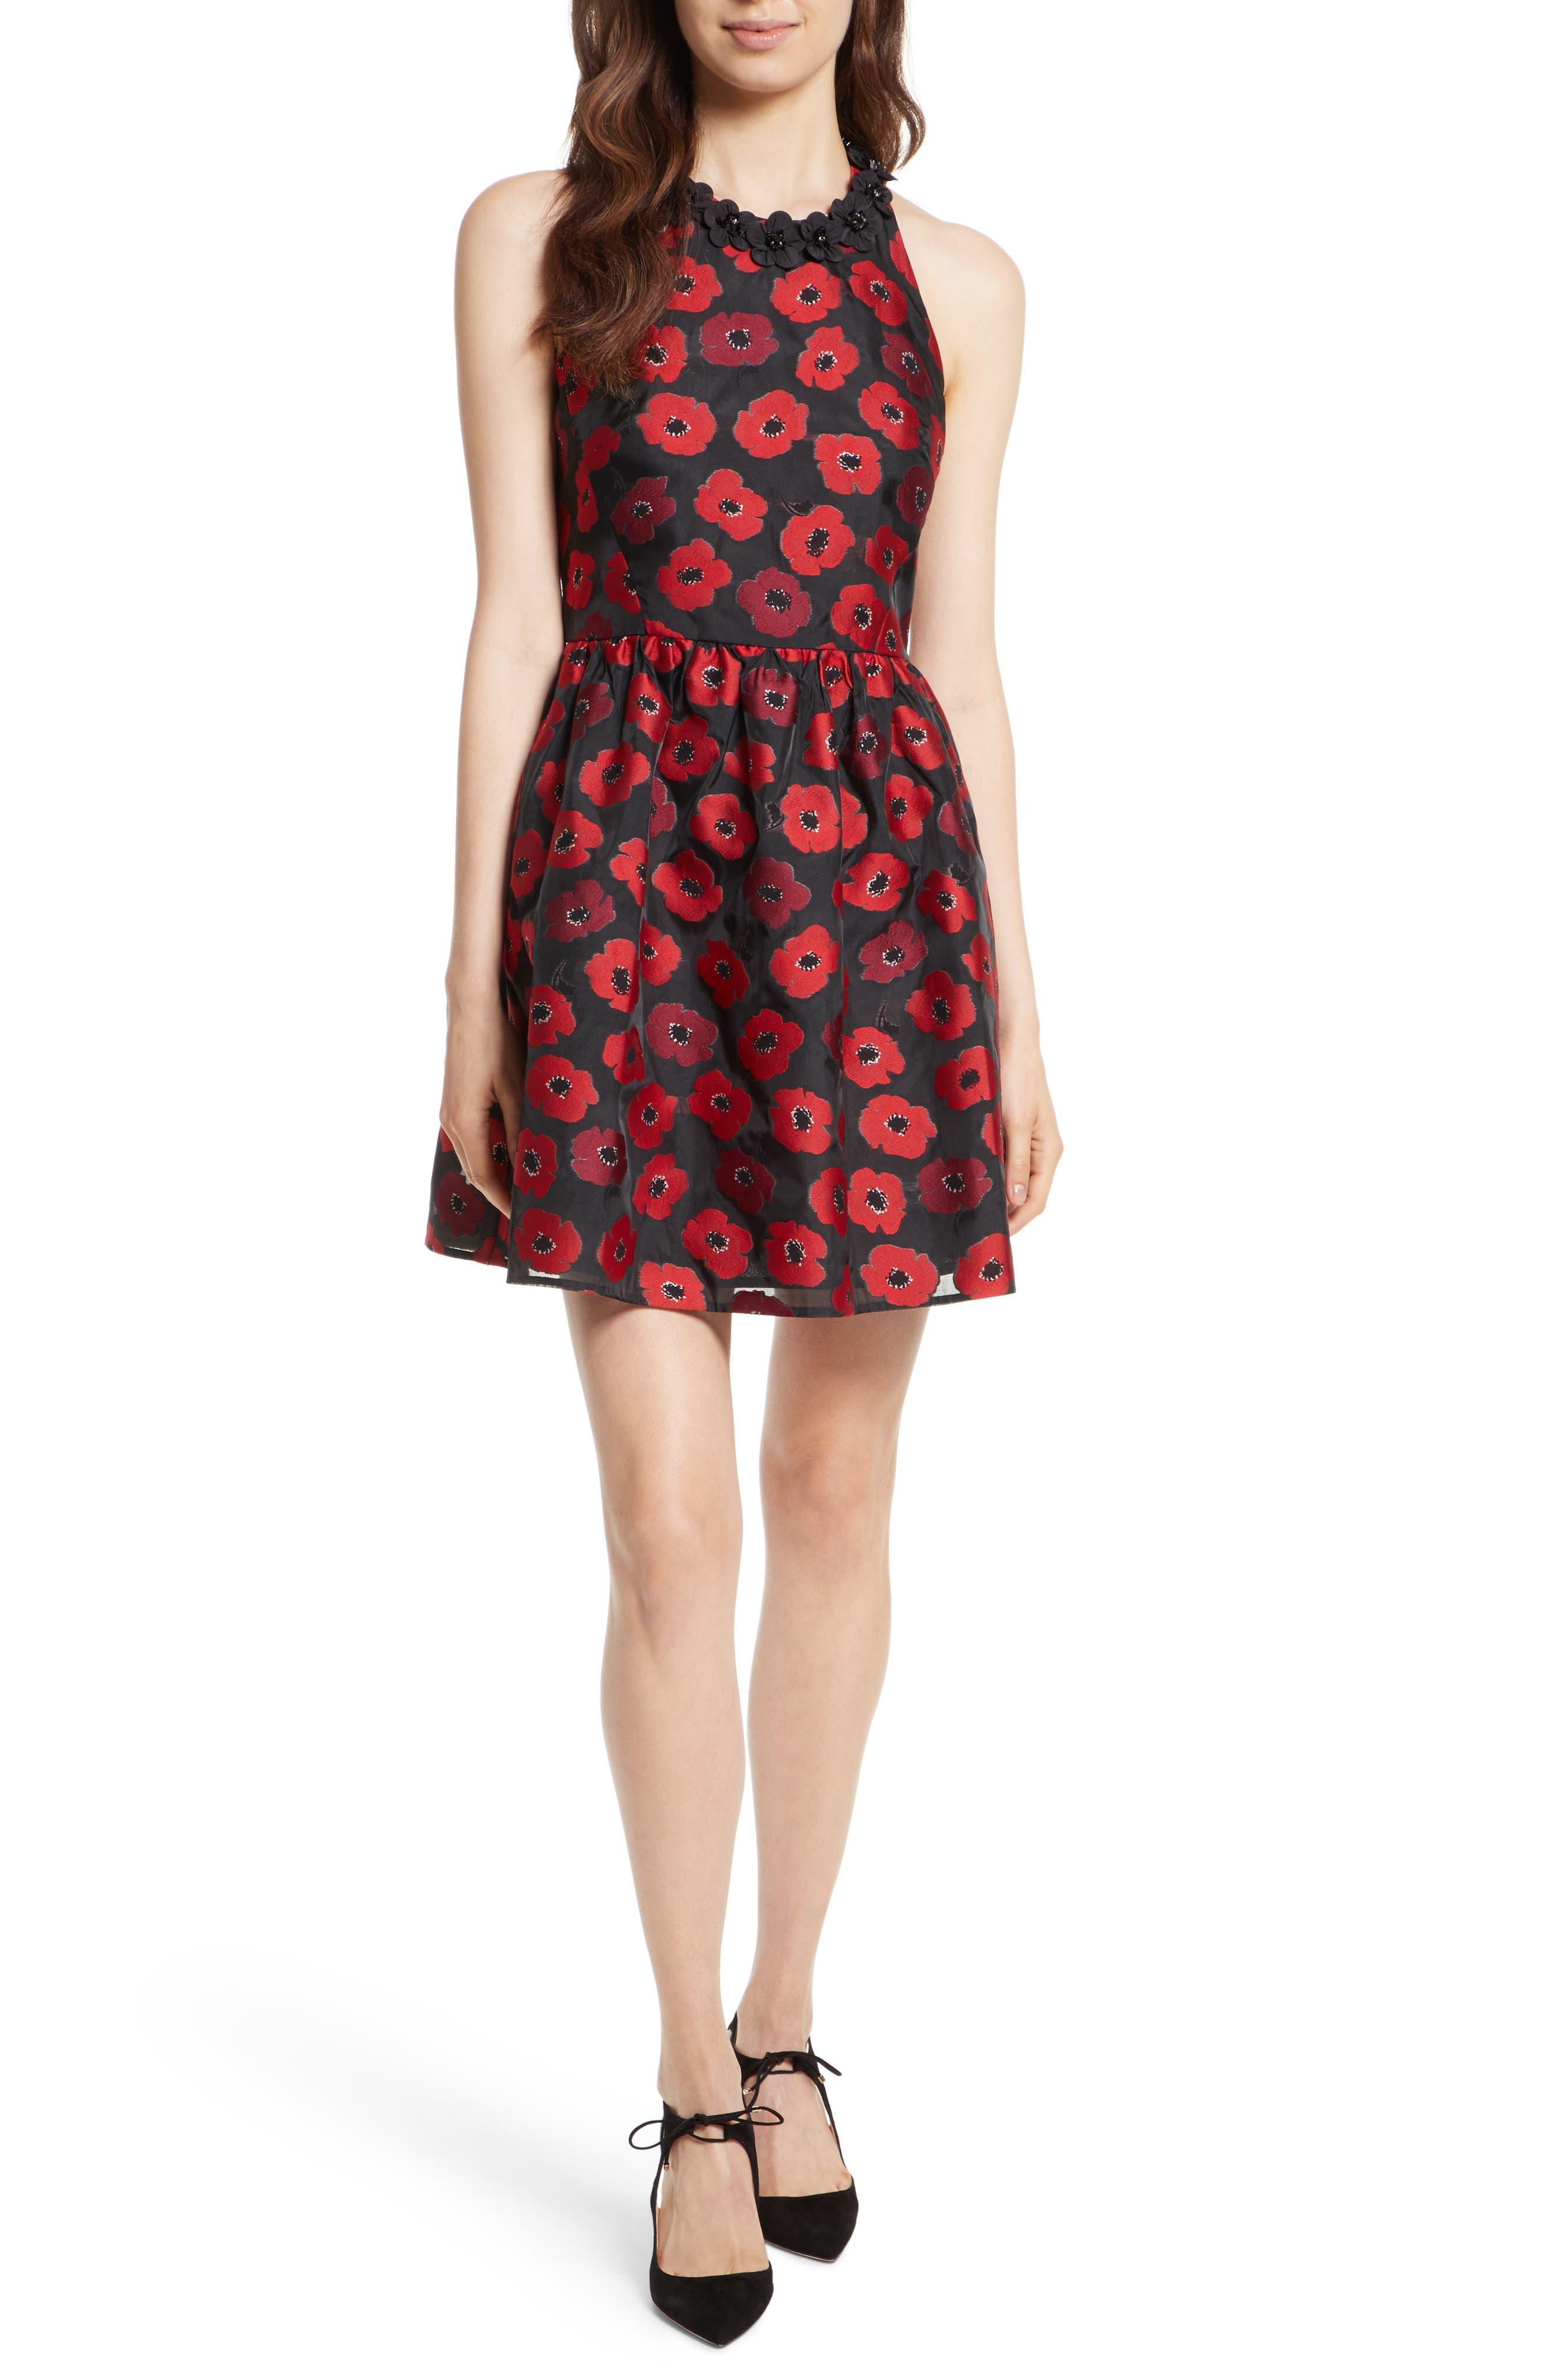 kate spade new york poppy jacquard dress